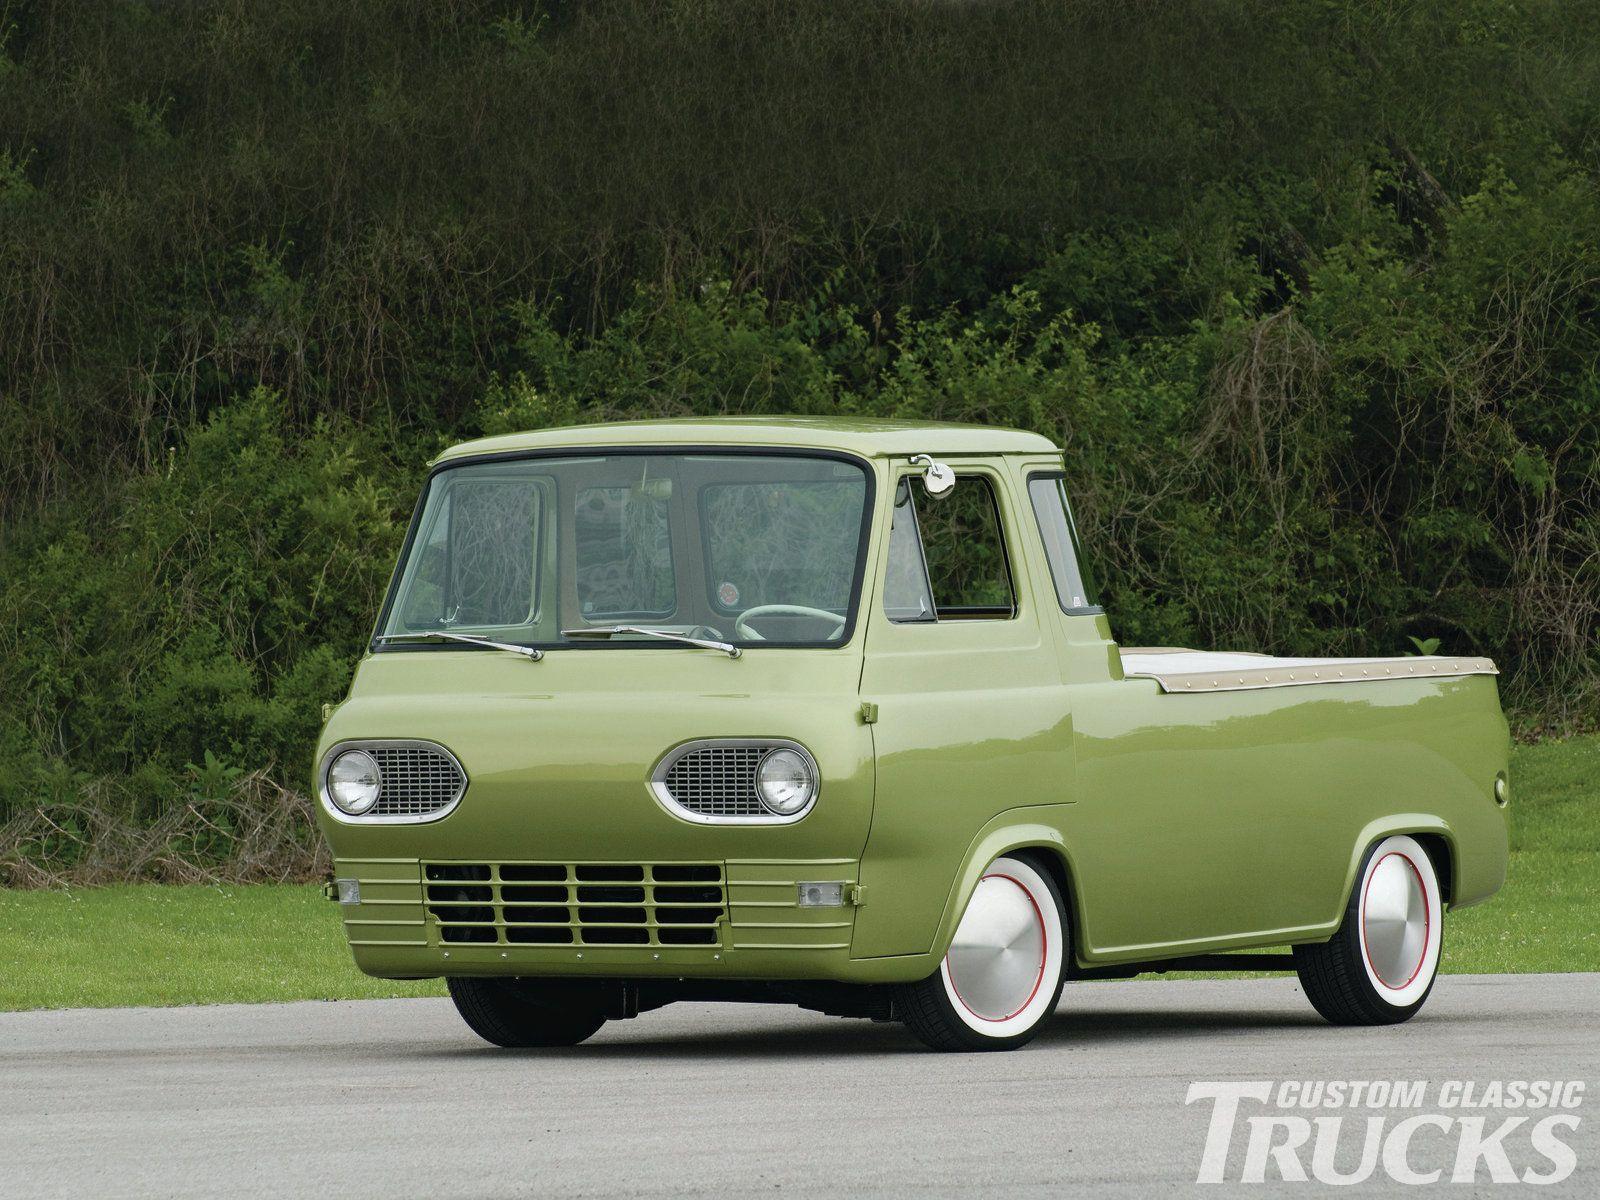 1962 Ford E 100 Econoline Deluxe Cab Custom Classic Trucks